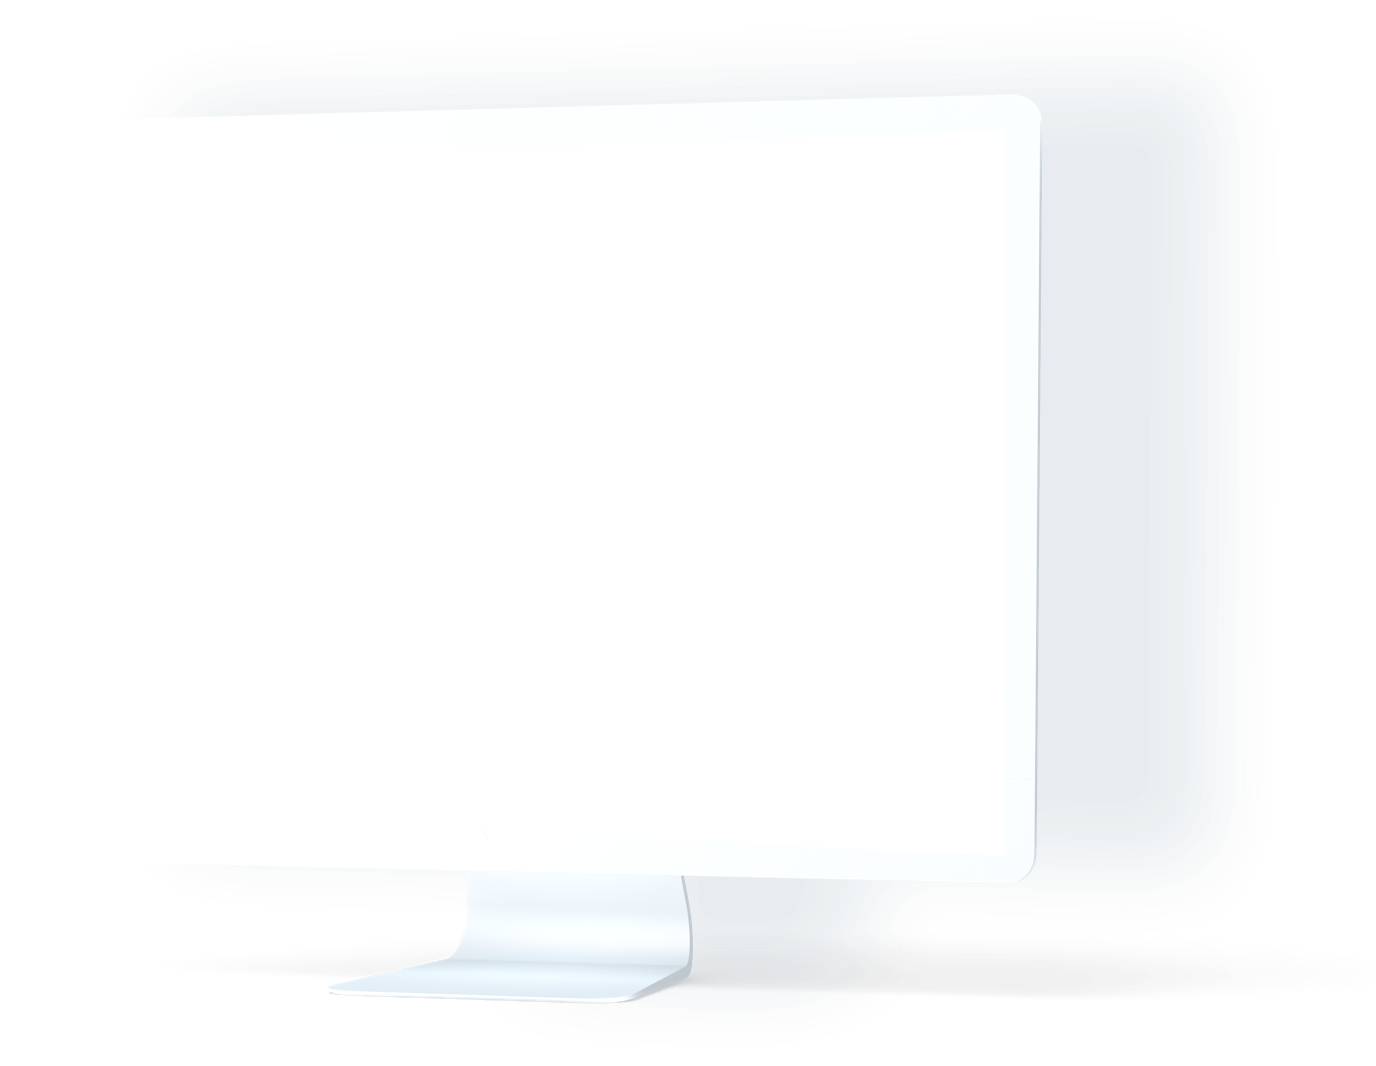 Desktop White Background Image